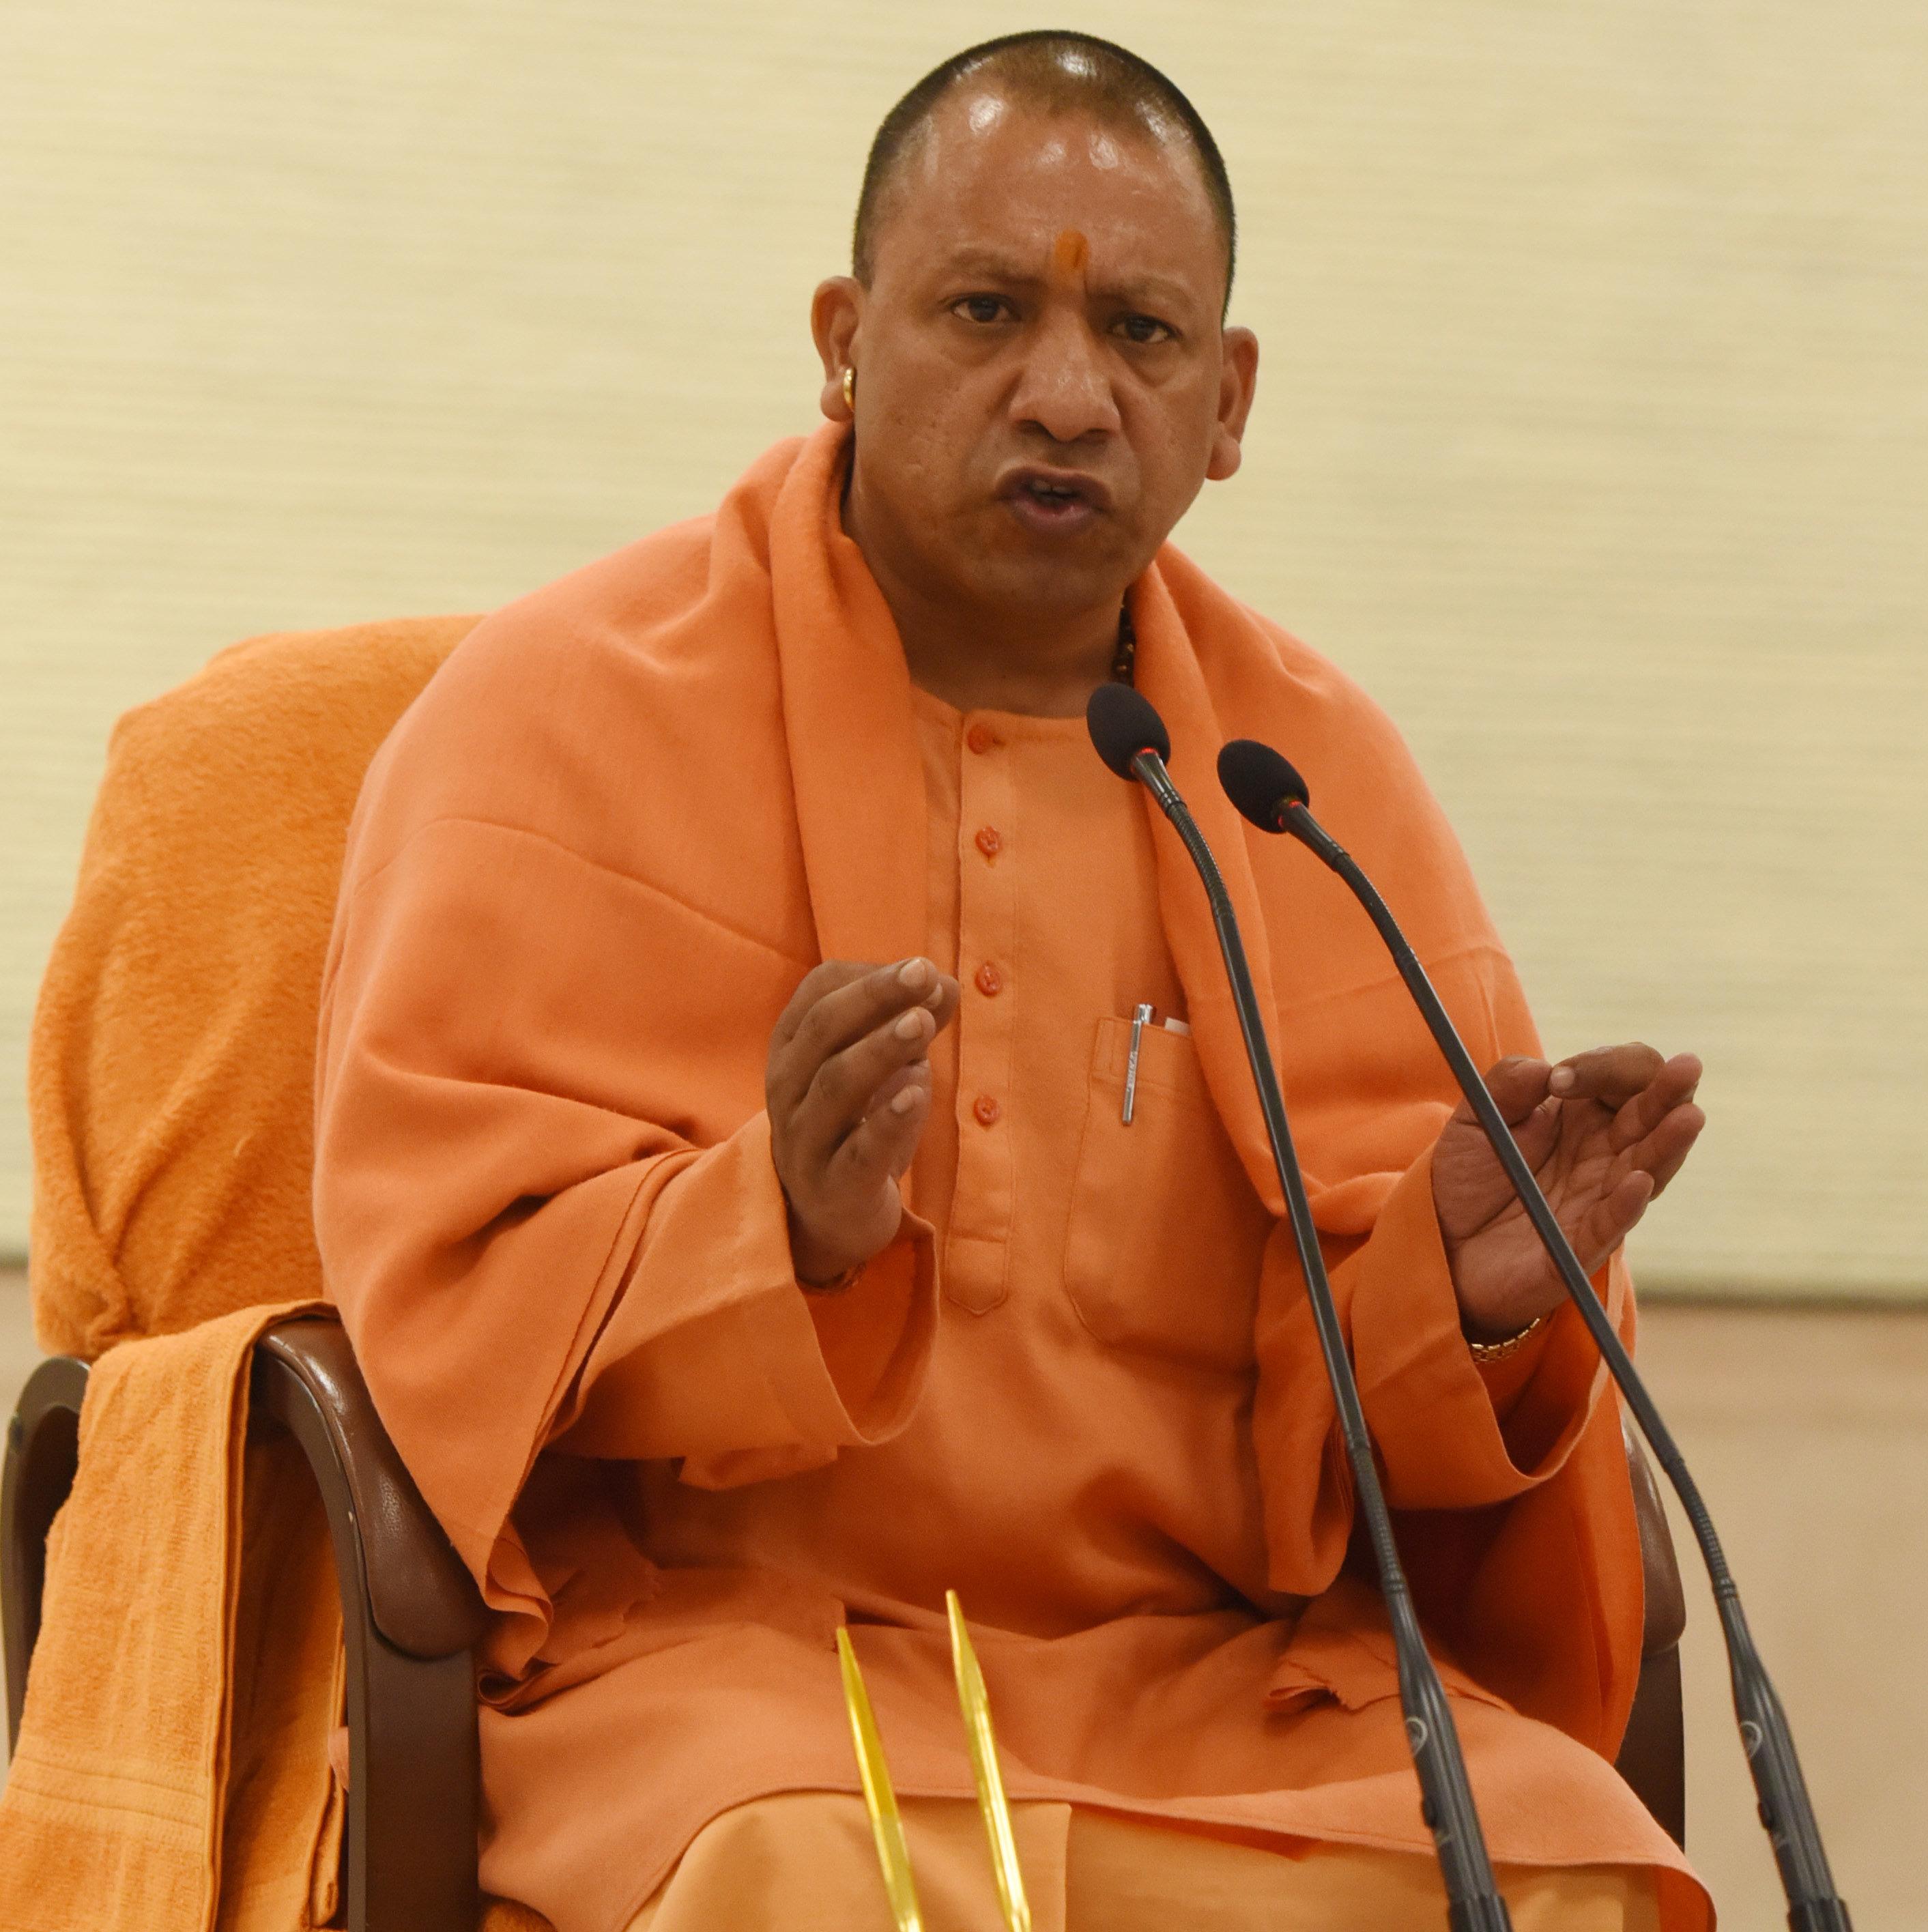 No Riots In Uttar Pradesh Since 2017? Yogi Adityanath Needs A Reality